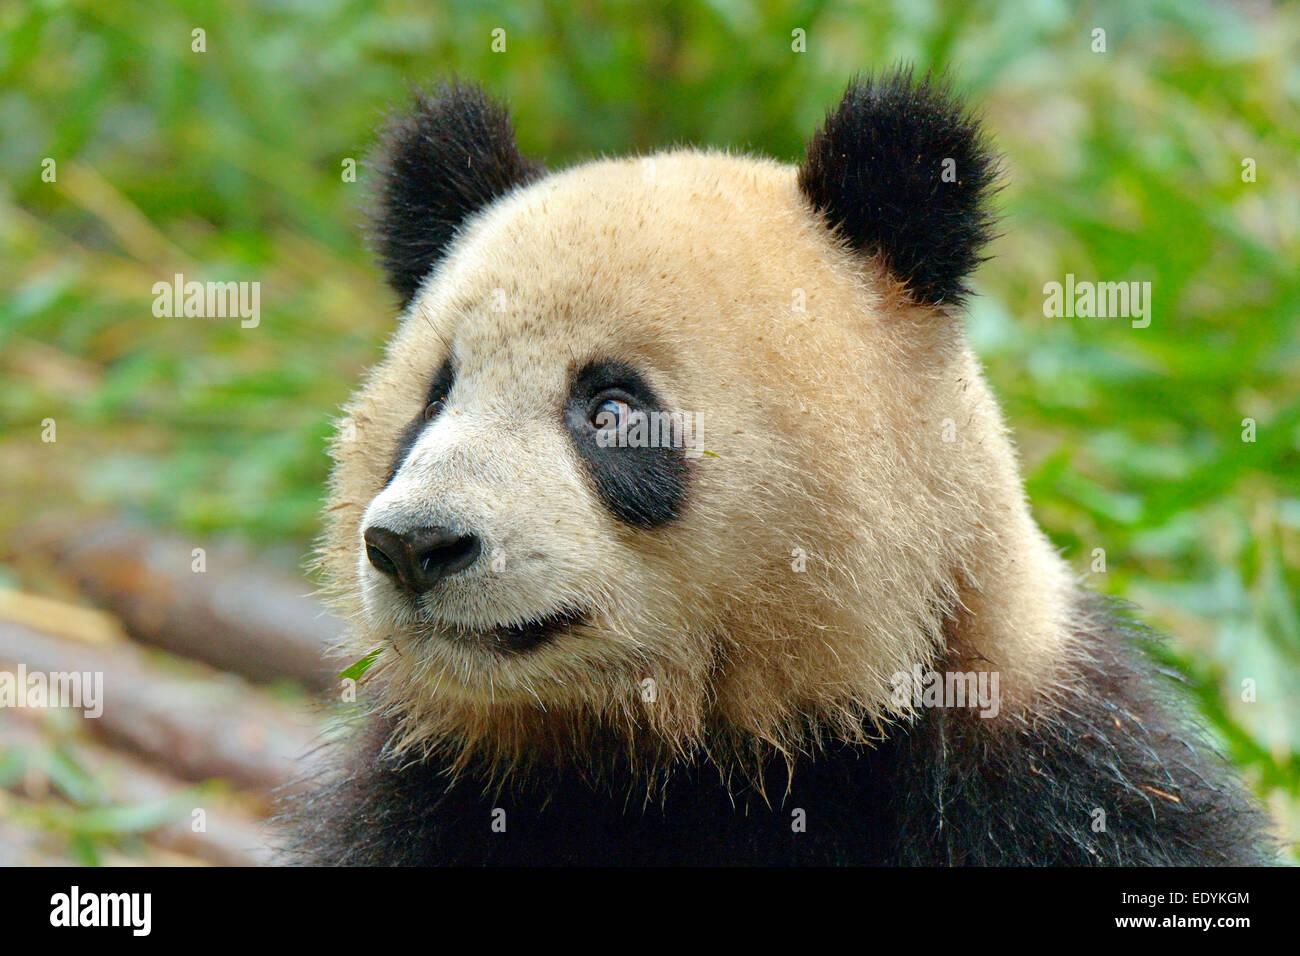 Großer Panda (Ailuropoda Melanoleuca), Gefangenschaft, Chengdu Research Base of Giant Panda Breeding oder Chengdu Stockbild